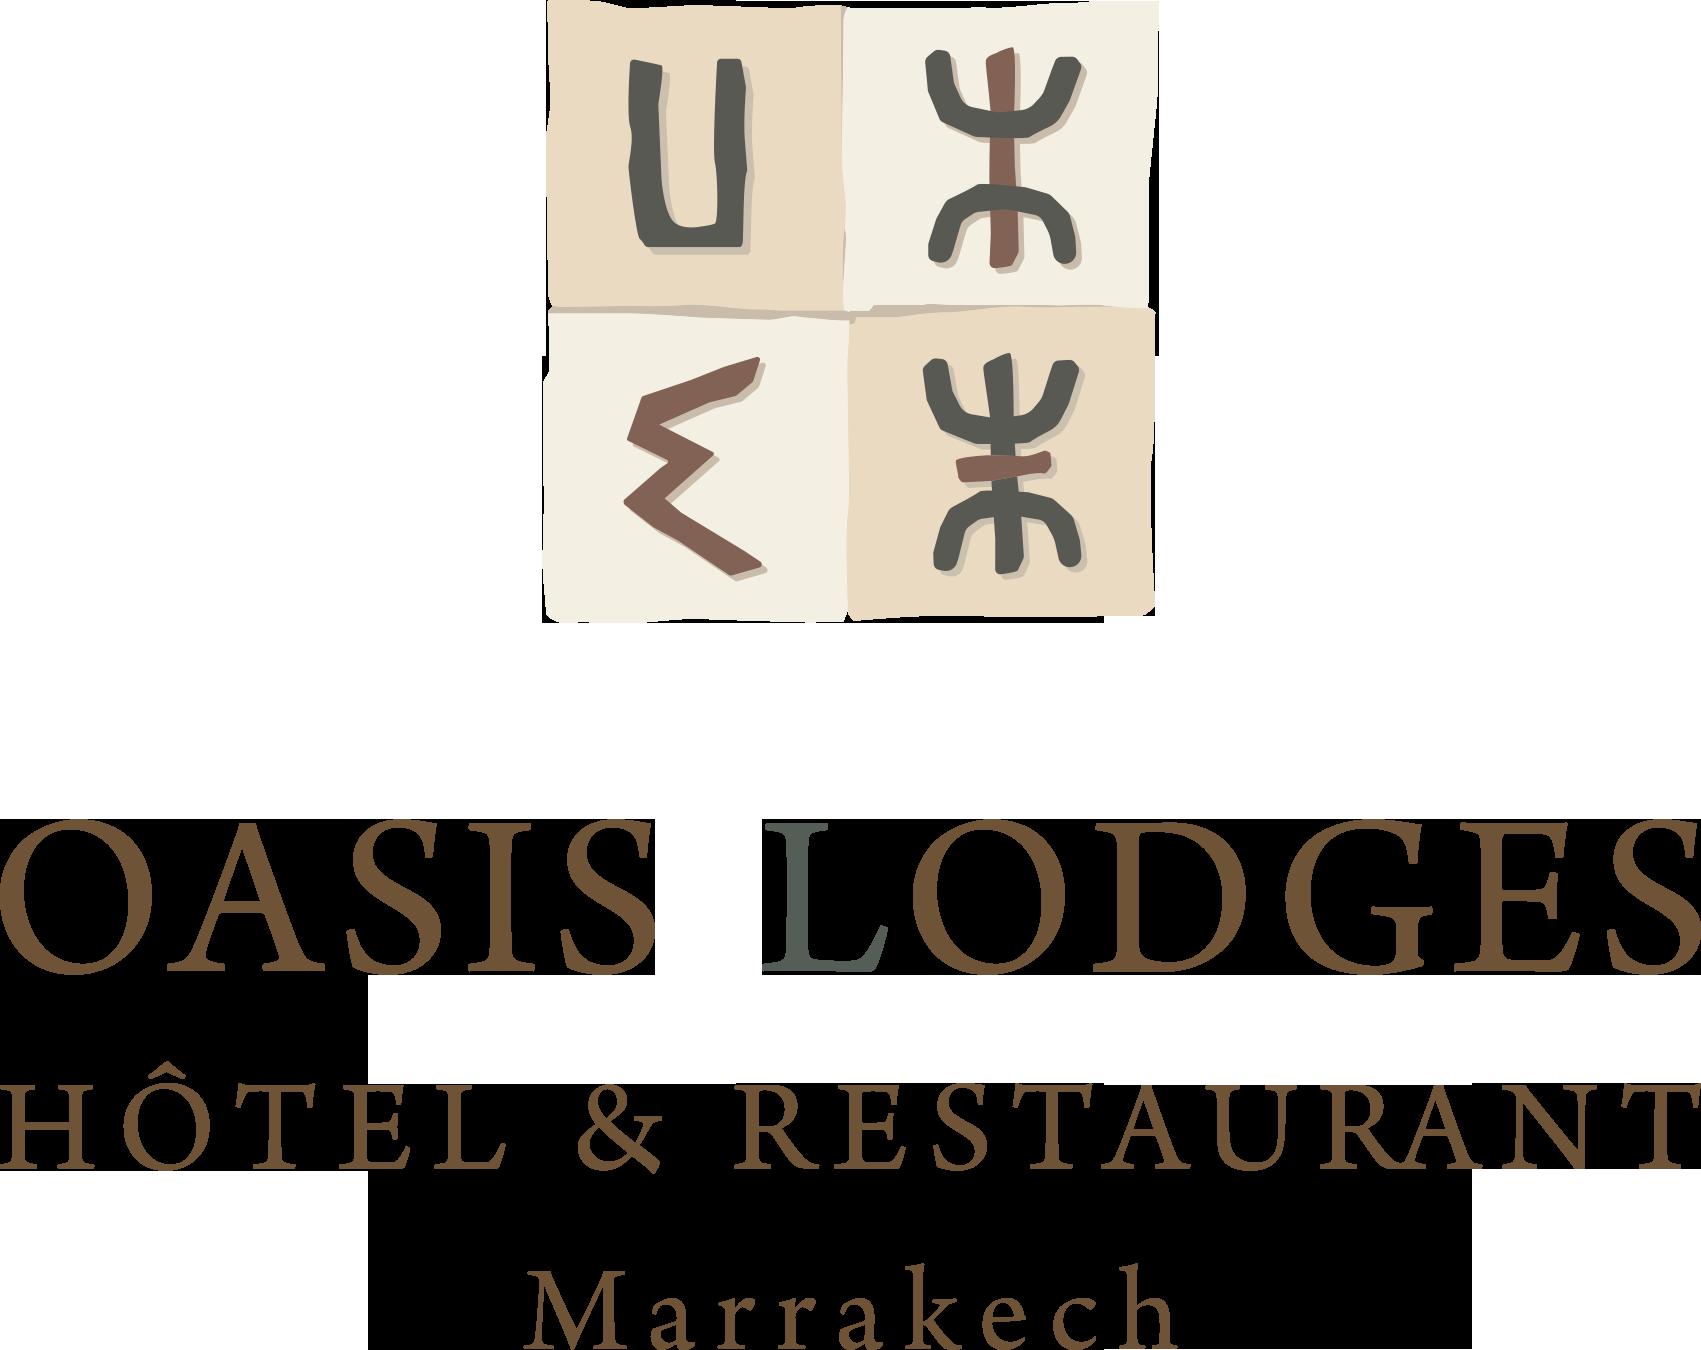 logo oasis lodges Hôtel & restaurant marrakech 2020 verticallogo oasis lodges Hôtel & restaurant marrakech 2020 vertical